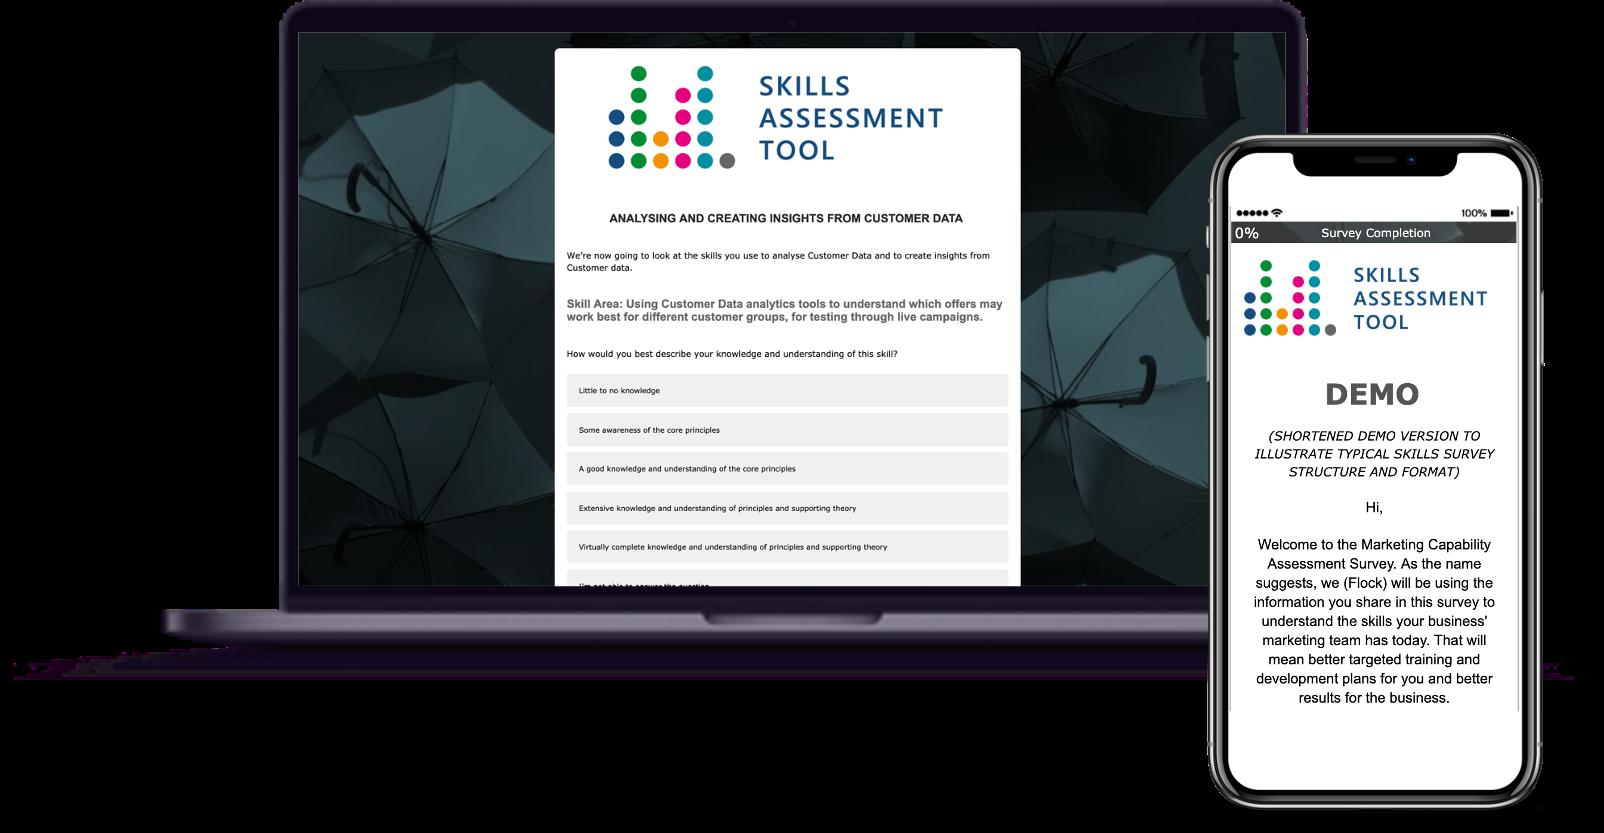 skills assessment tool png